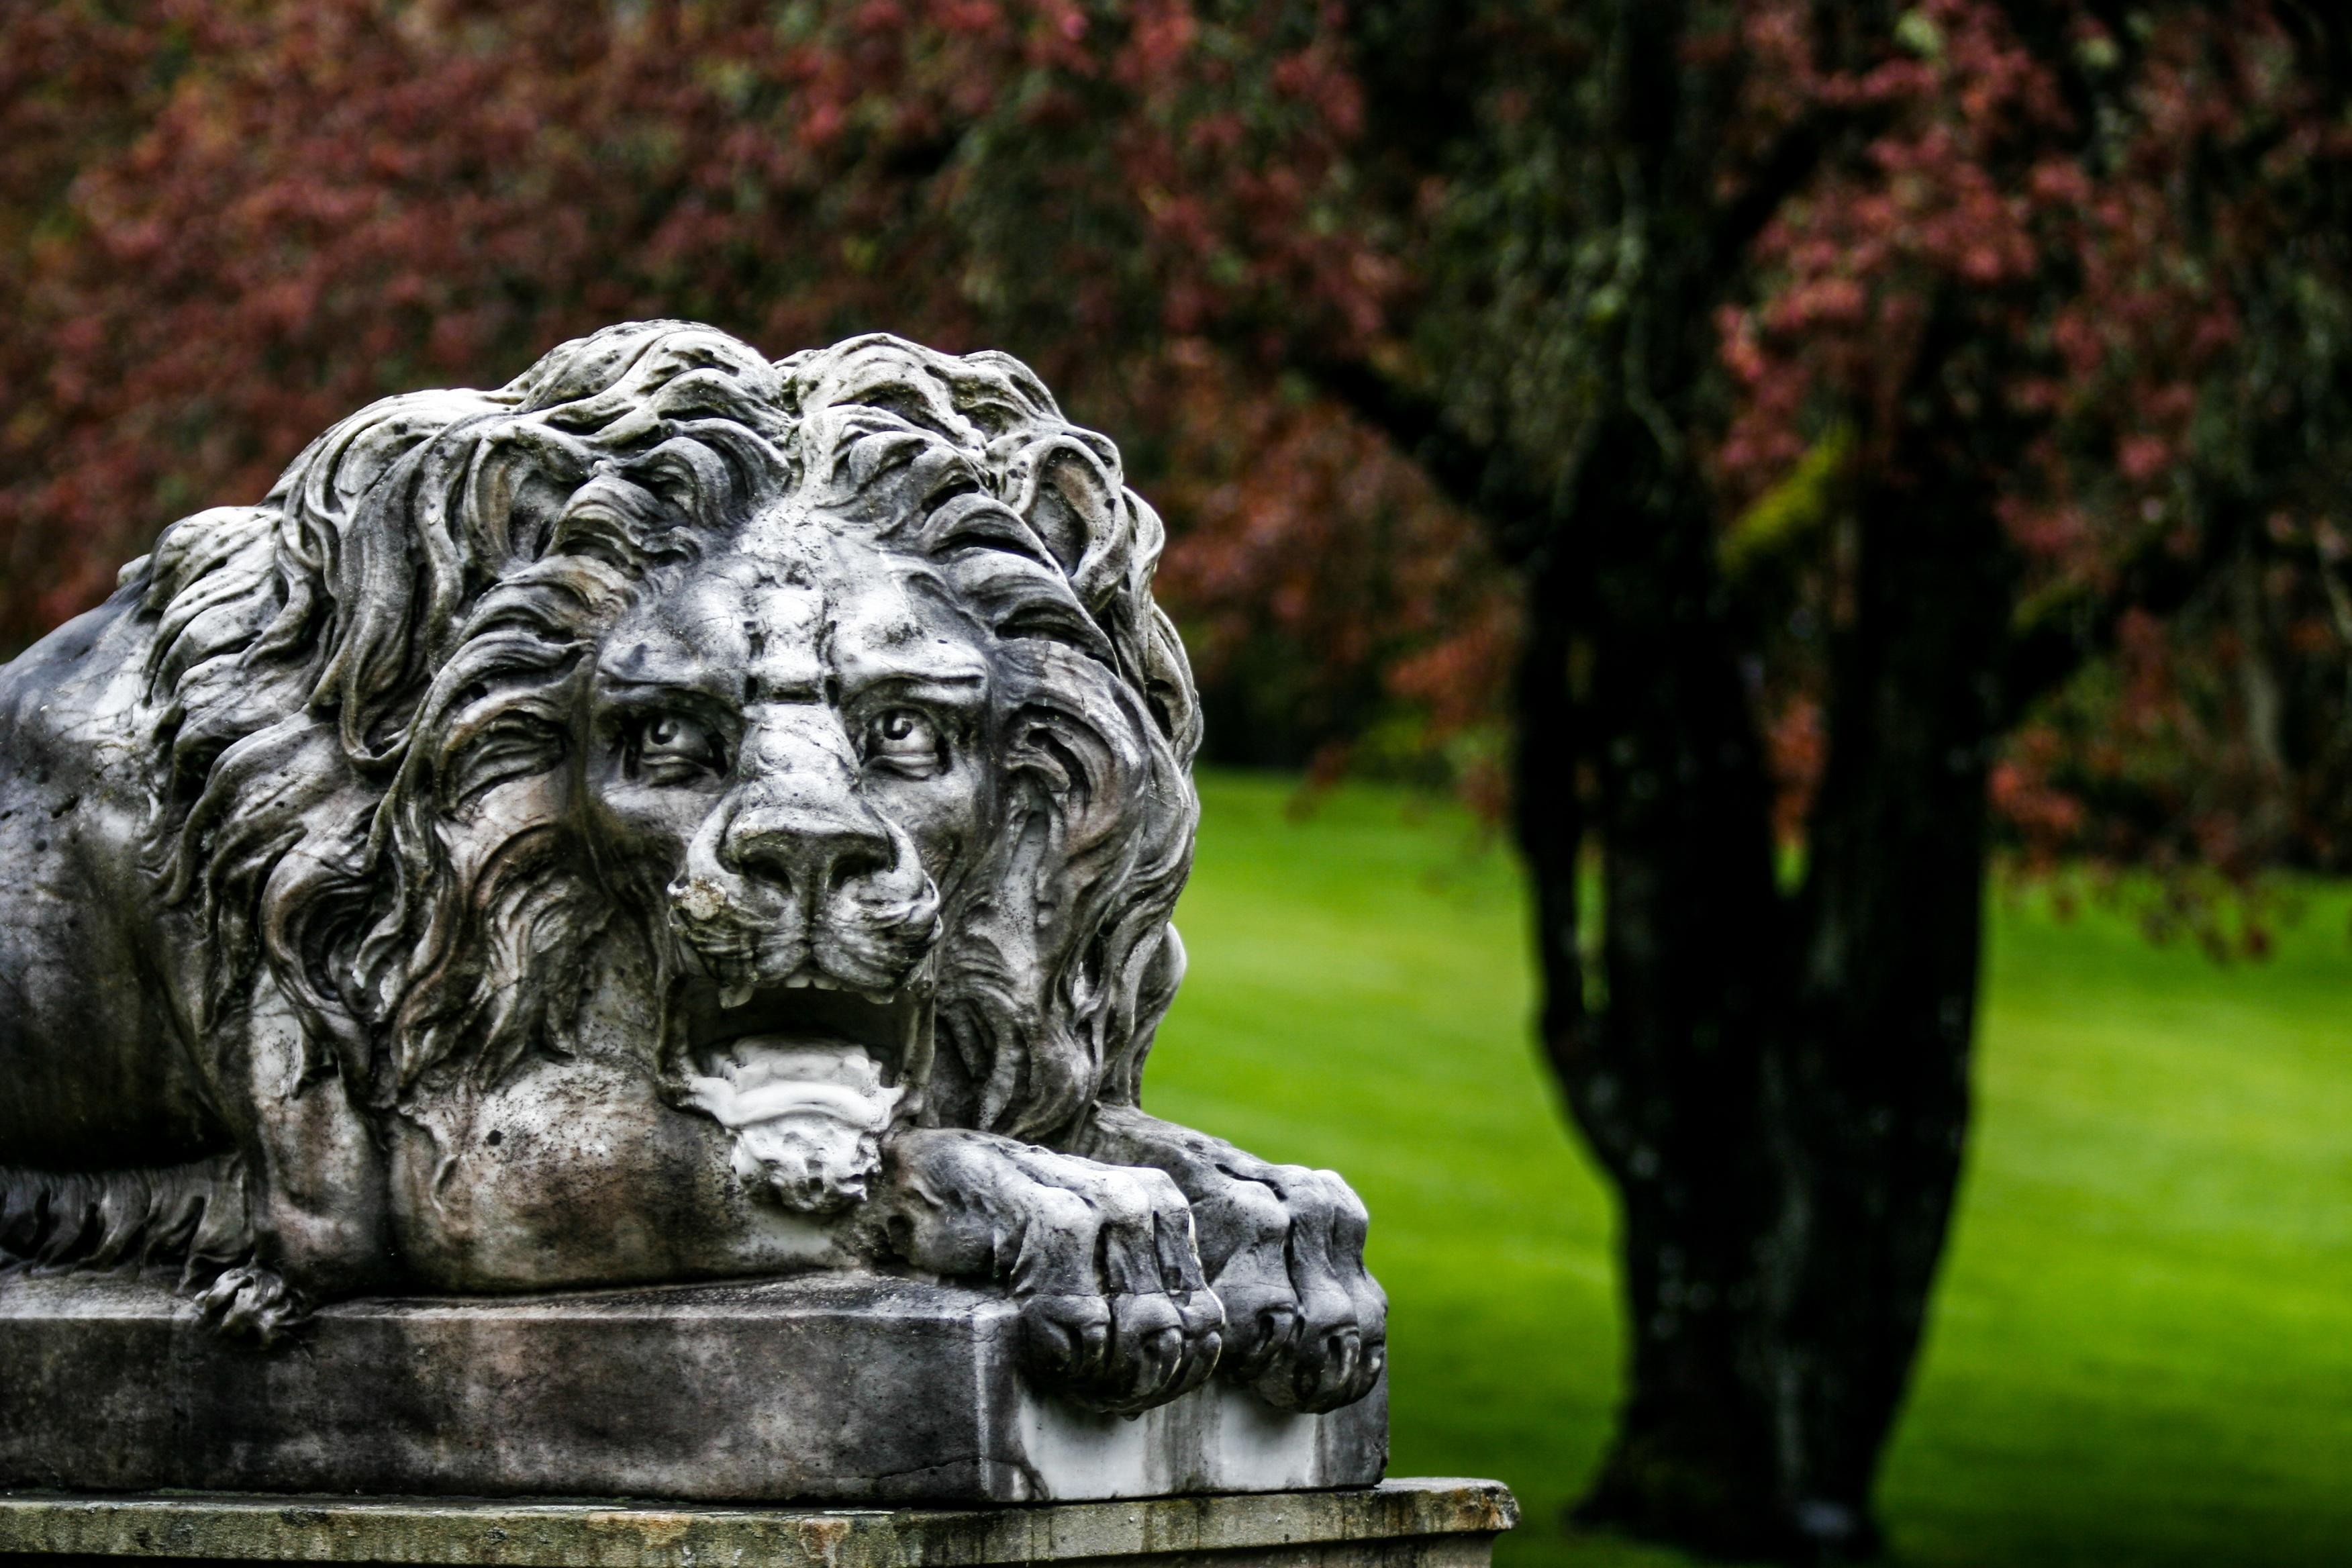 Fotos gratis arquitectura antiguo piedra monumento Estatuas decoracion